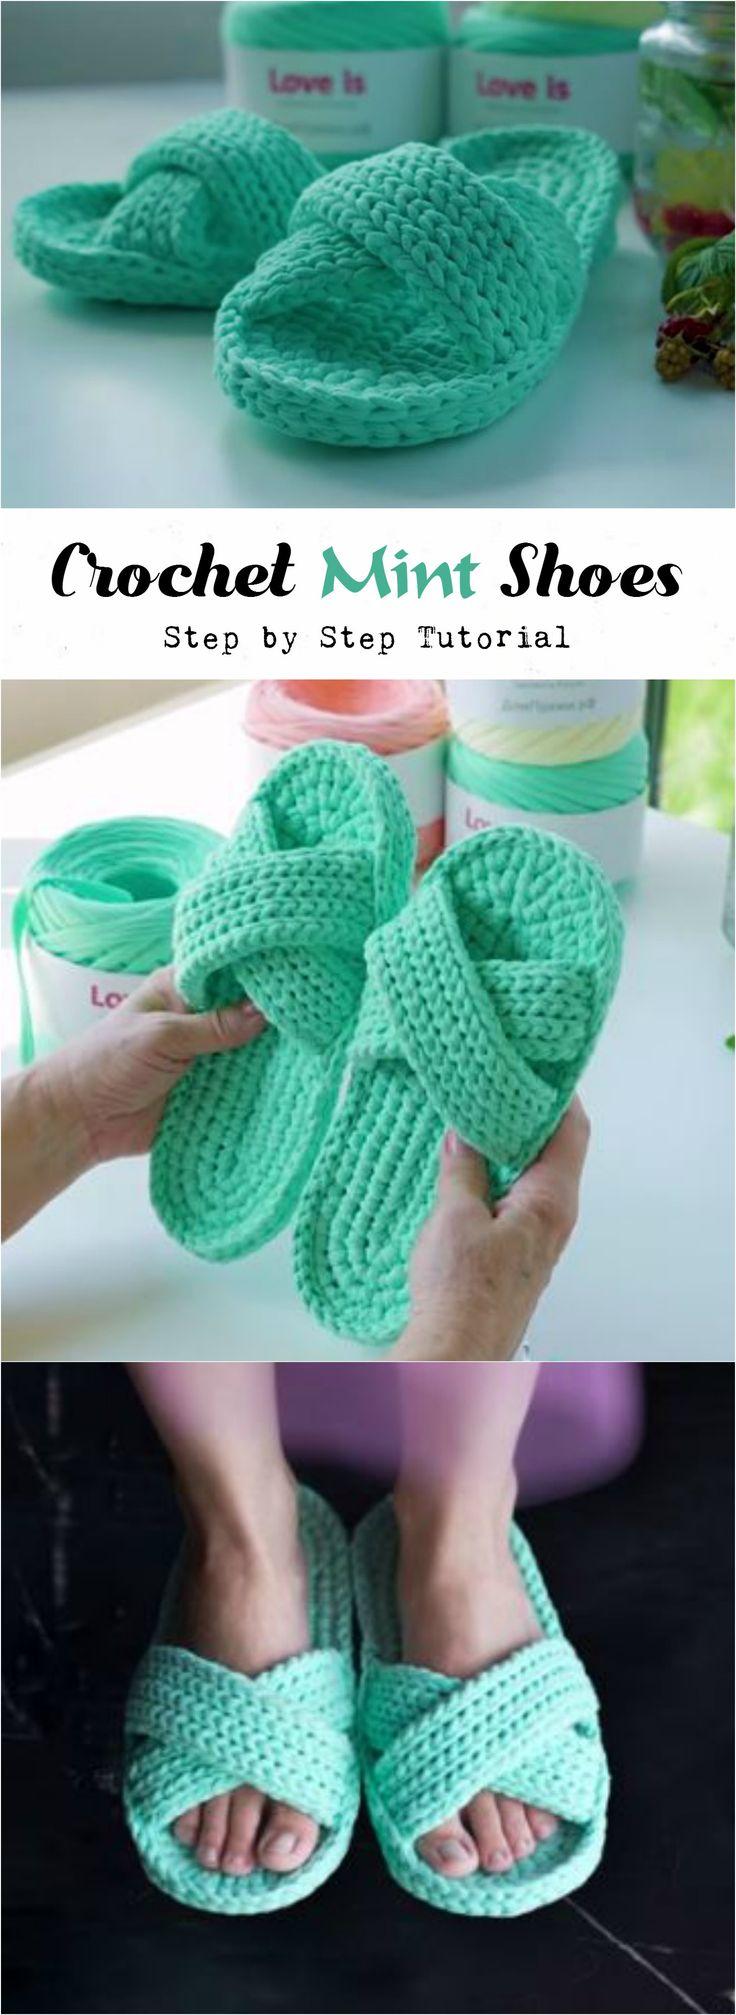 Crochet Mint Shoes